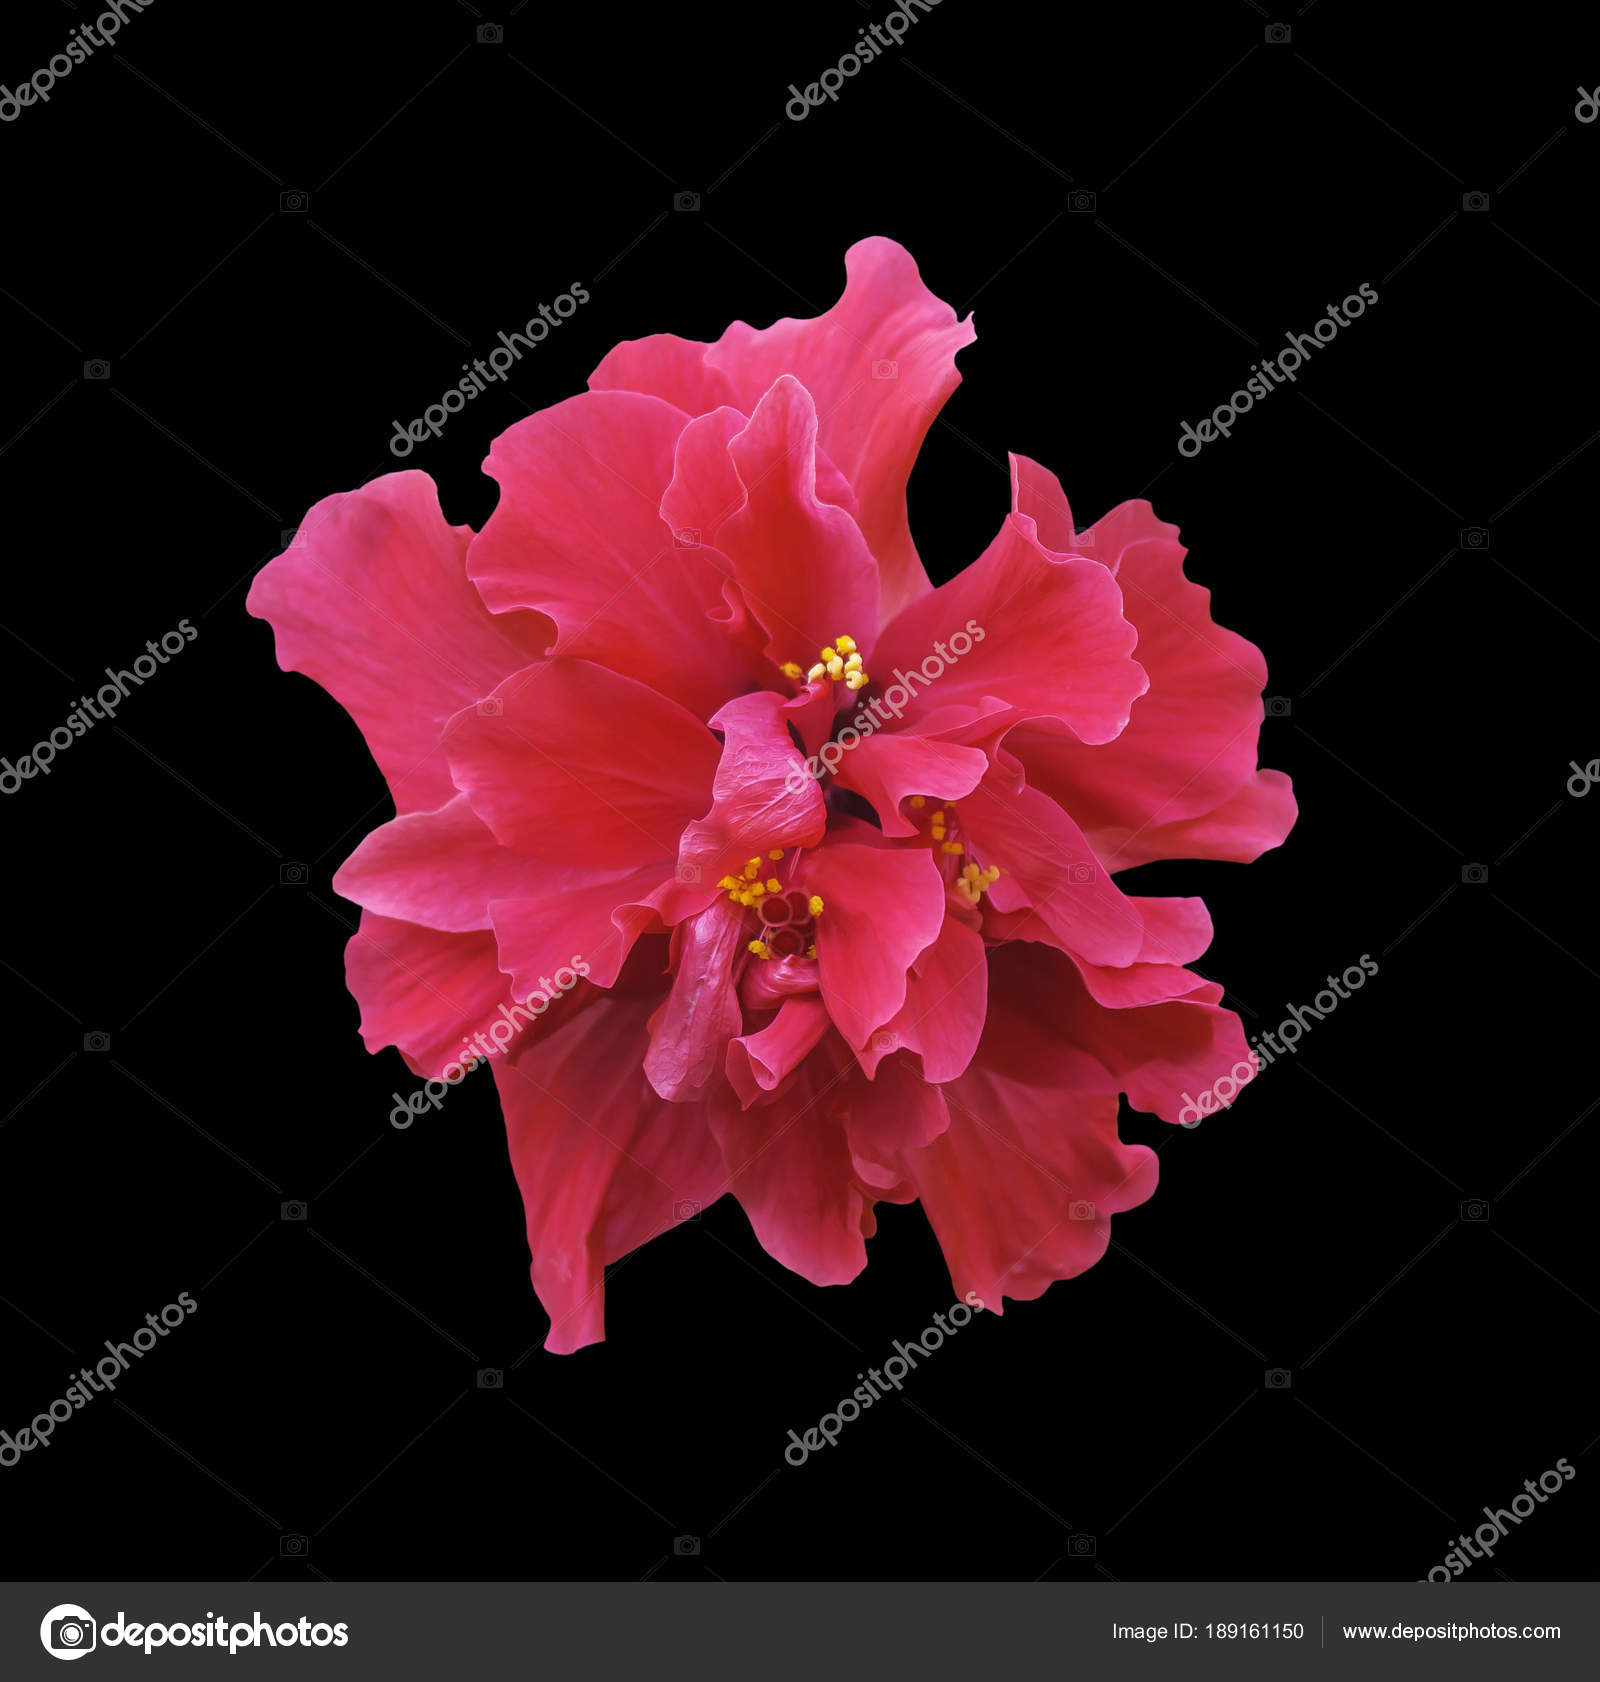 Red hibiscus flower isolated on black stock photo manusy 189161150 red hibiscus flower isolated on black stock photo izmirmasajfo